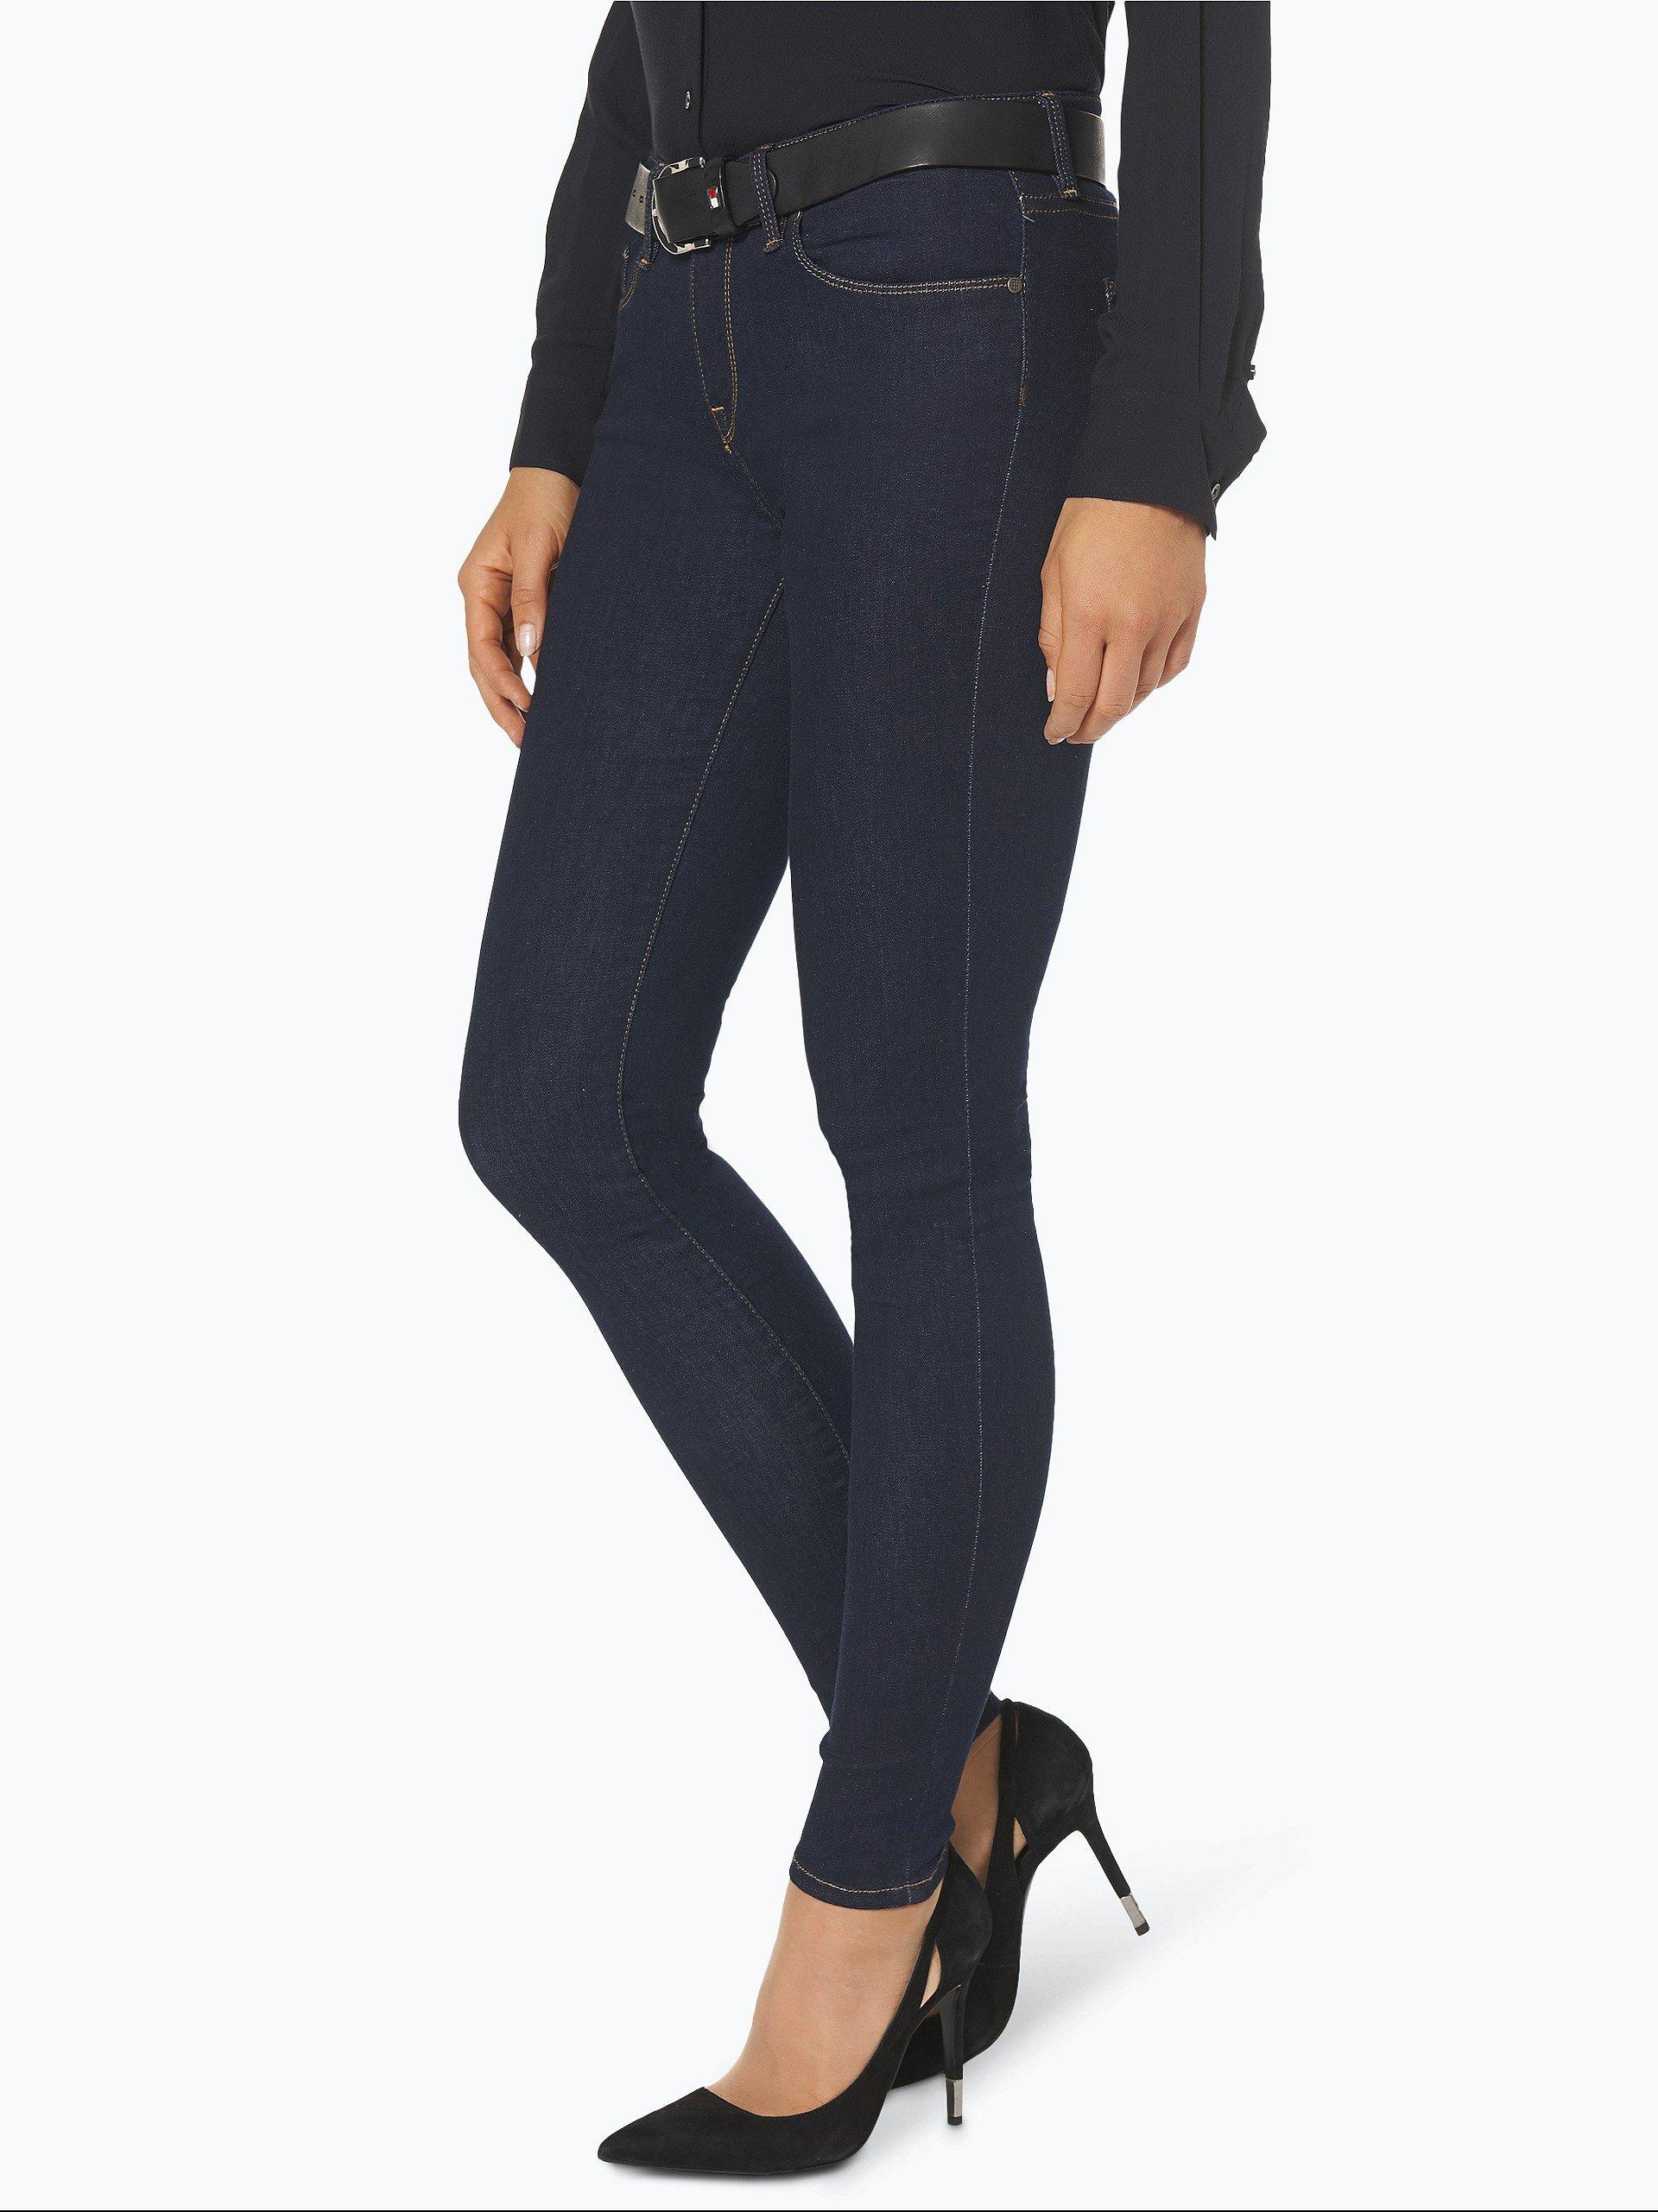 tommy hilfiger damen jeans como lw steffie online kaufen. Black Bedroom Furniture Sets. Home Design Ideas